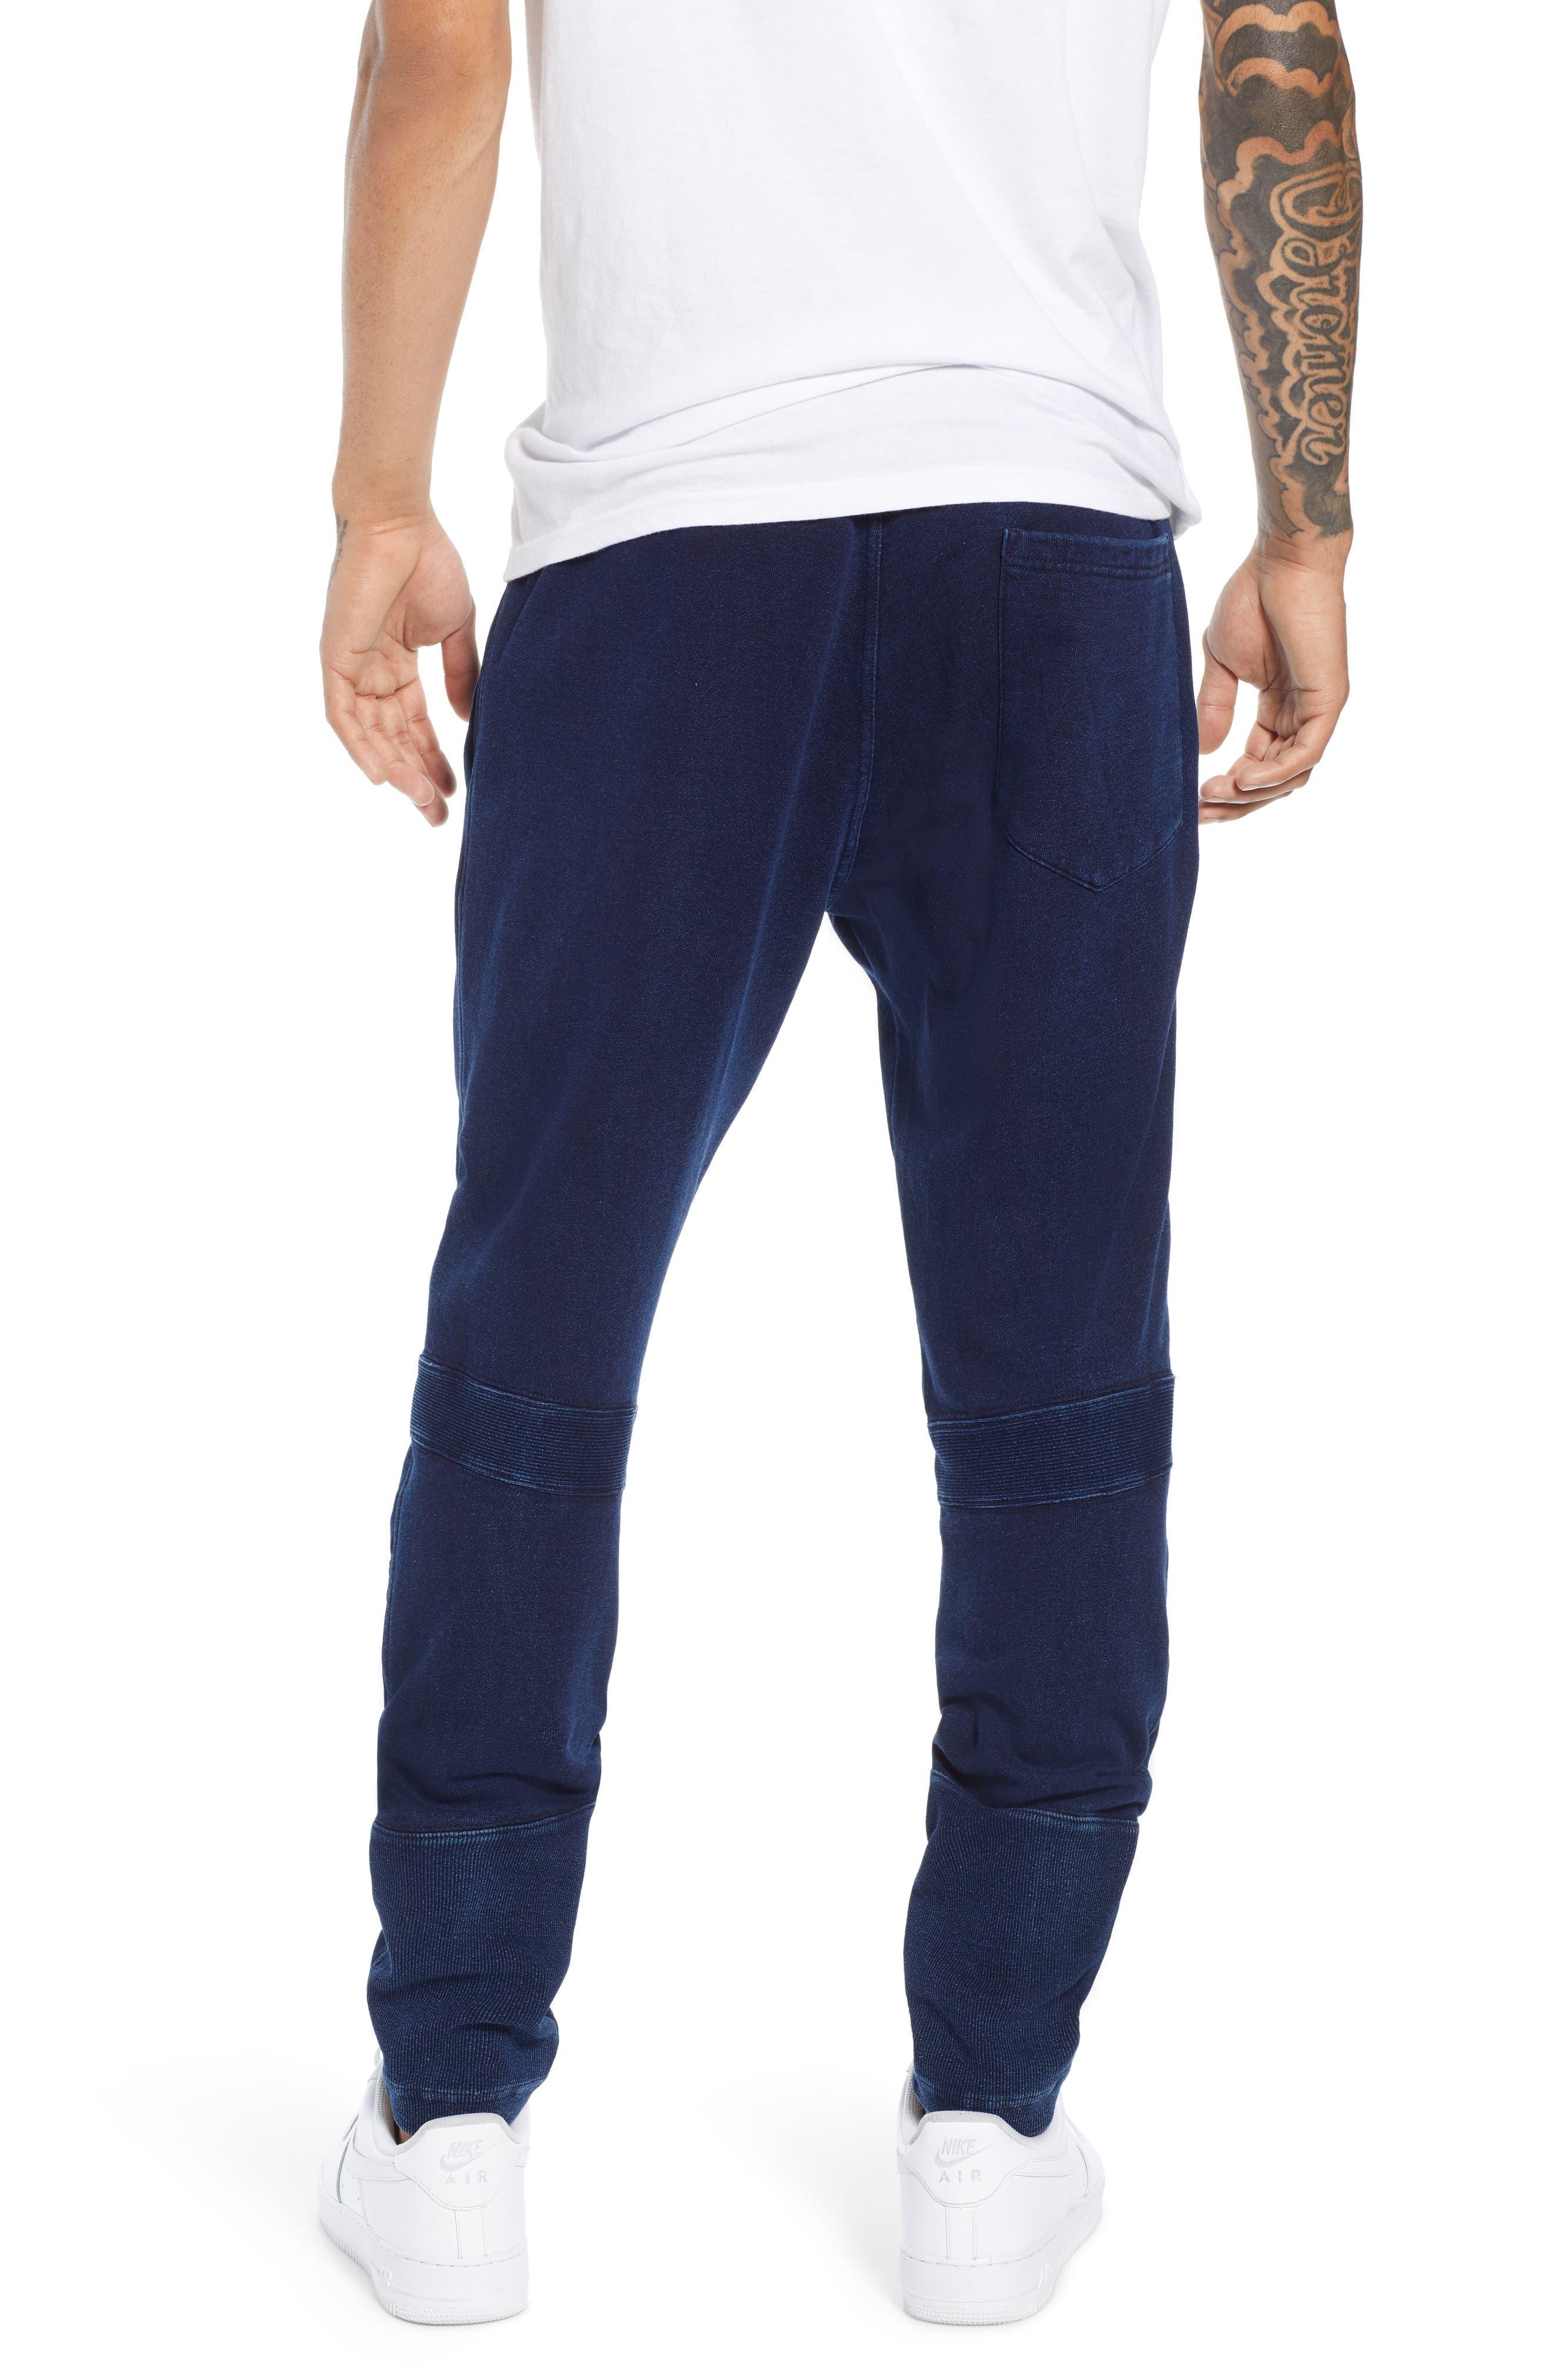 G-STAR RAW,                             Motac-X Slim Fit Sweat Pants,                             Alternate thumbnail 2, color,                             001